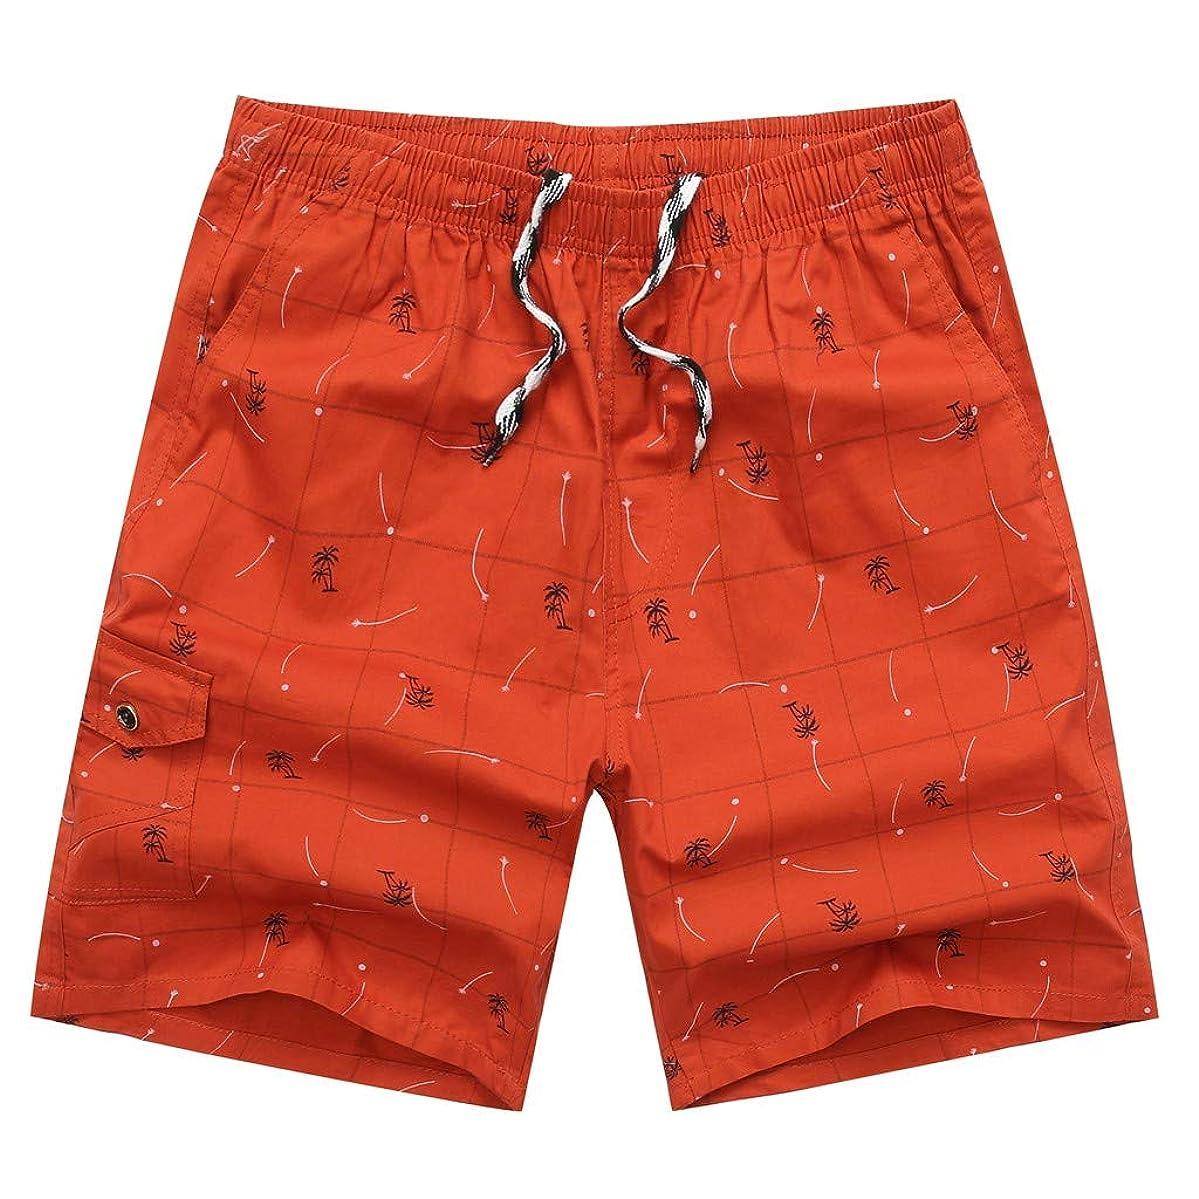 ZEFOTIM Shorts for Men 2019 Spring Summer Print Trunks Quick Dry Beach Surfing Running Short Pant